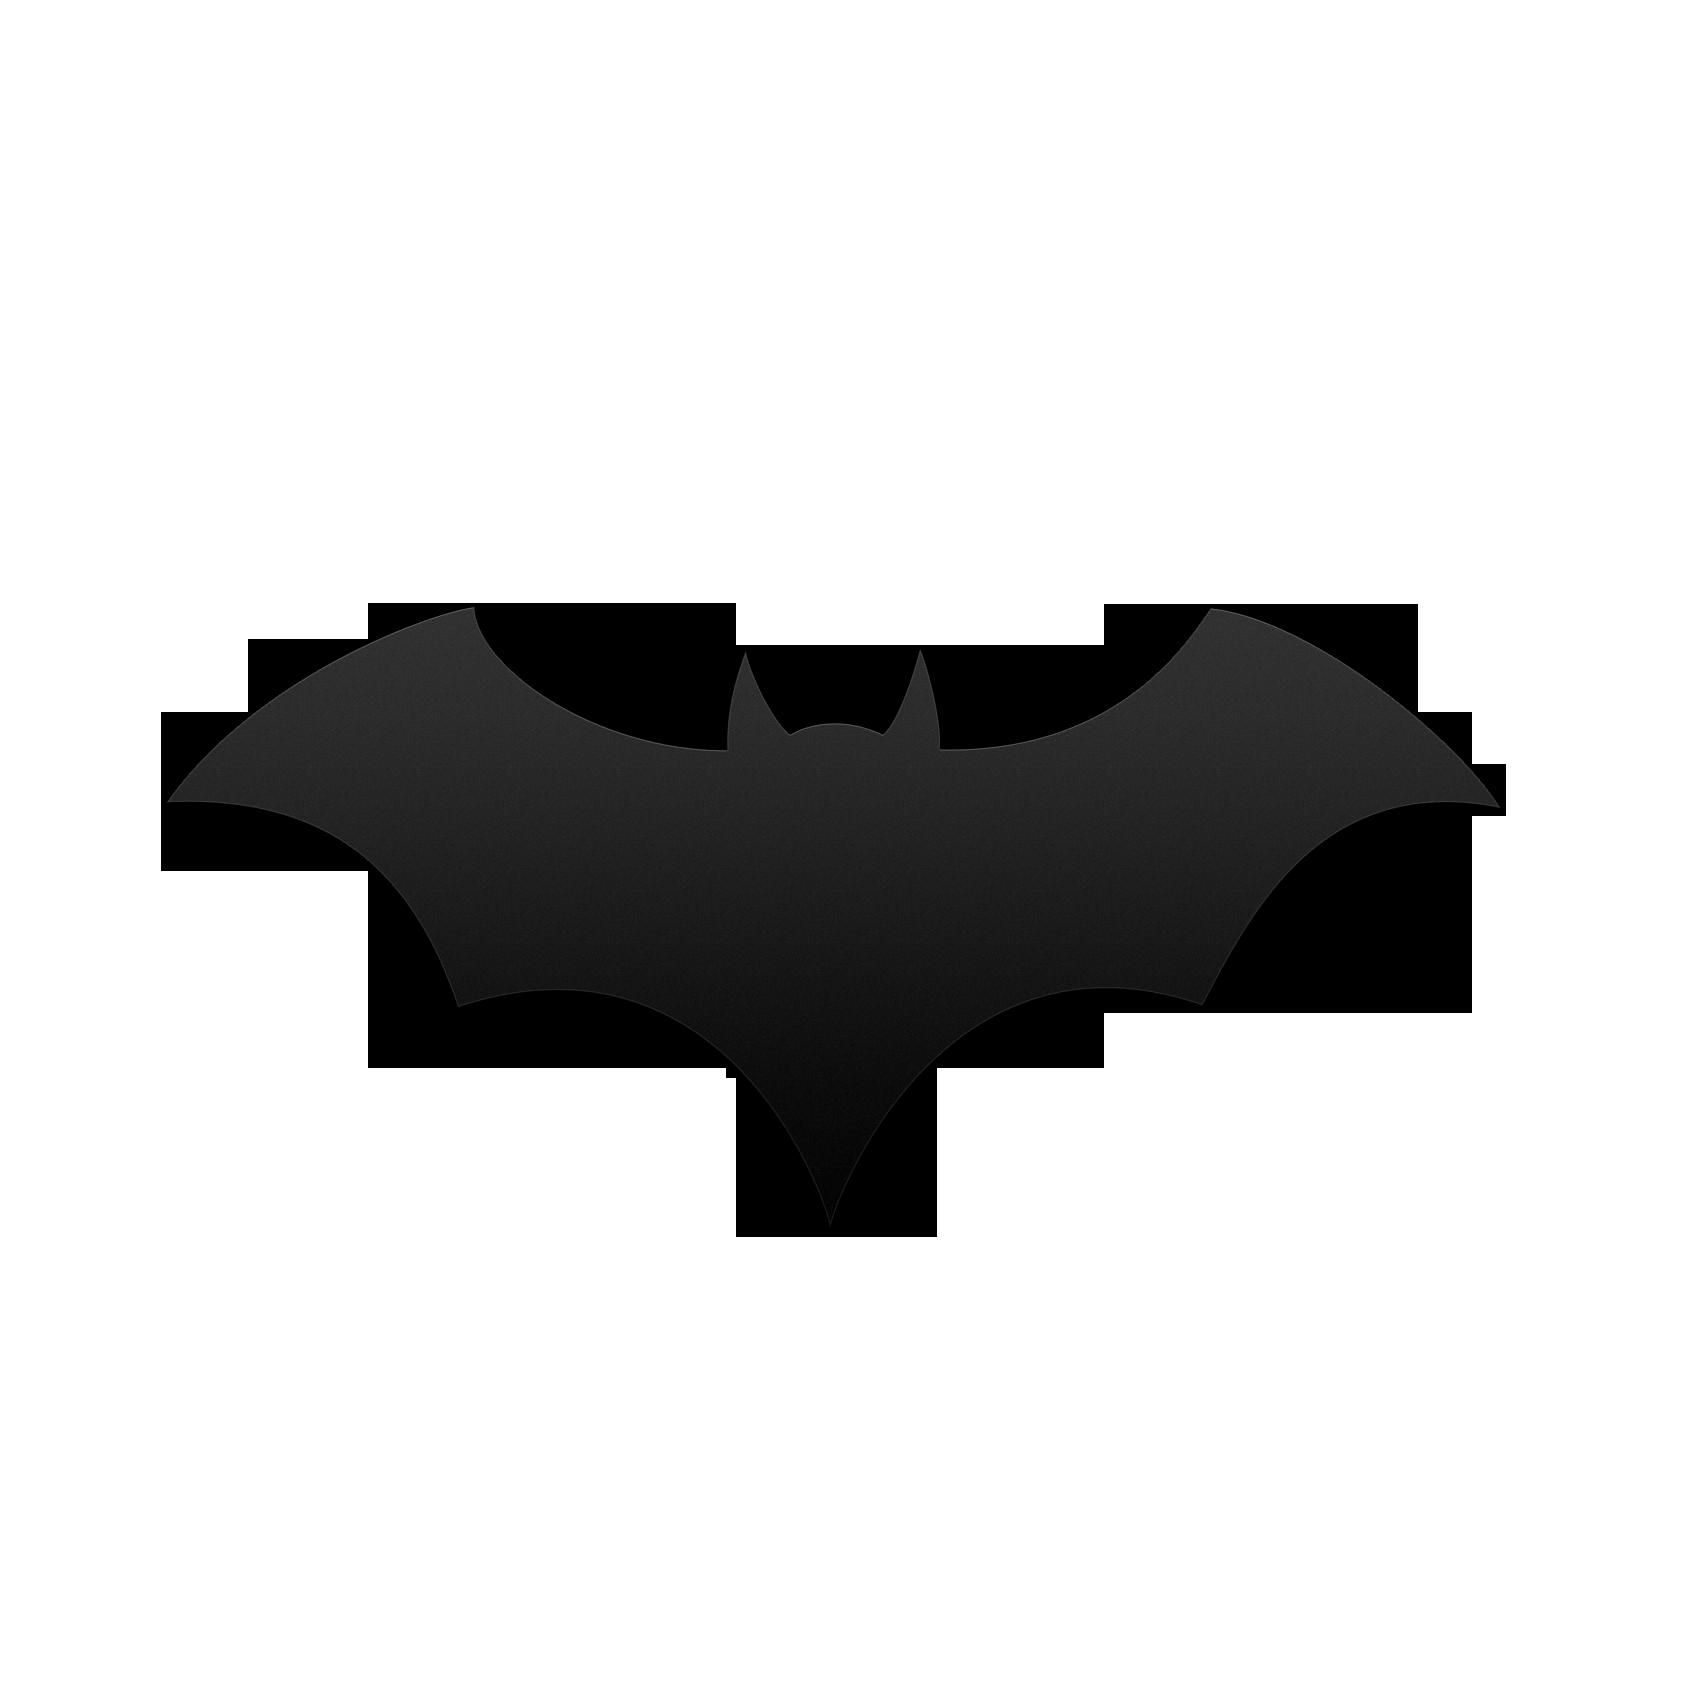 Silhouette at getdrawings com. Clipart bat upside down